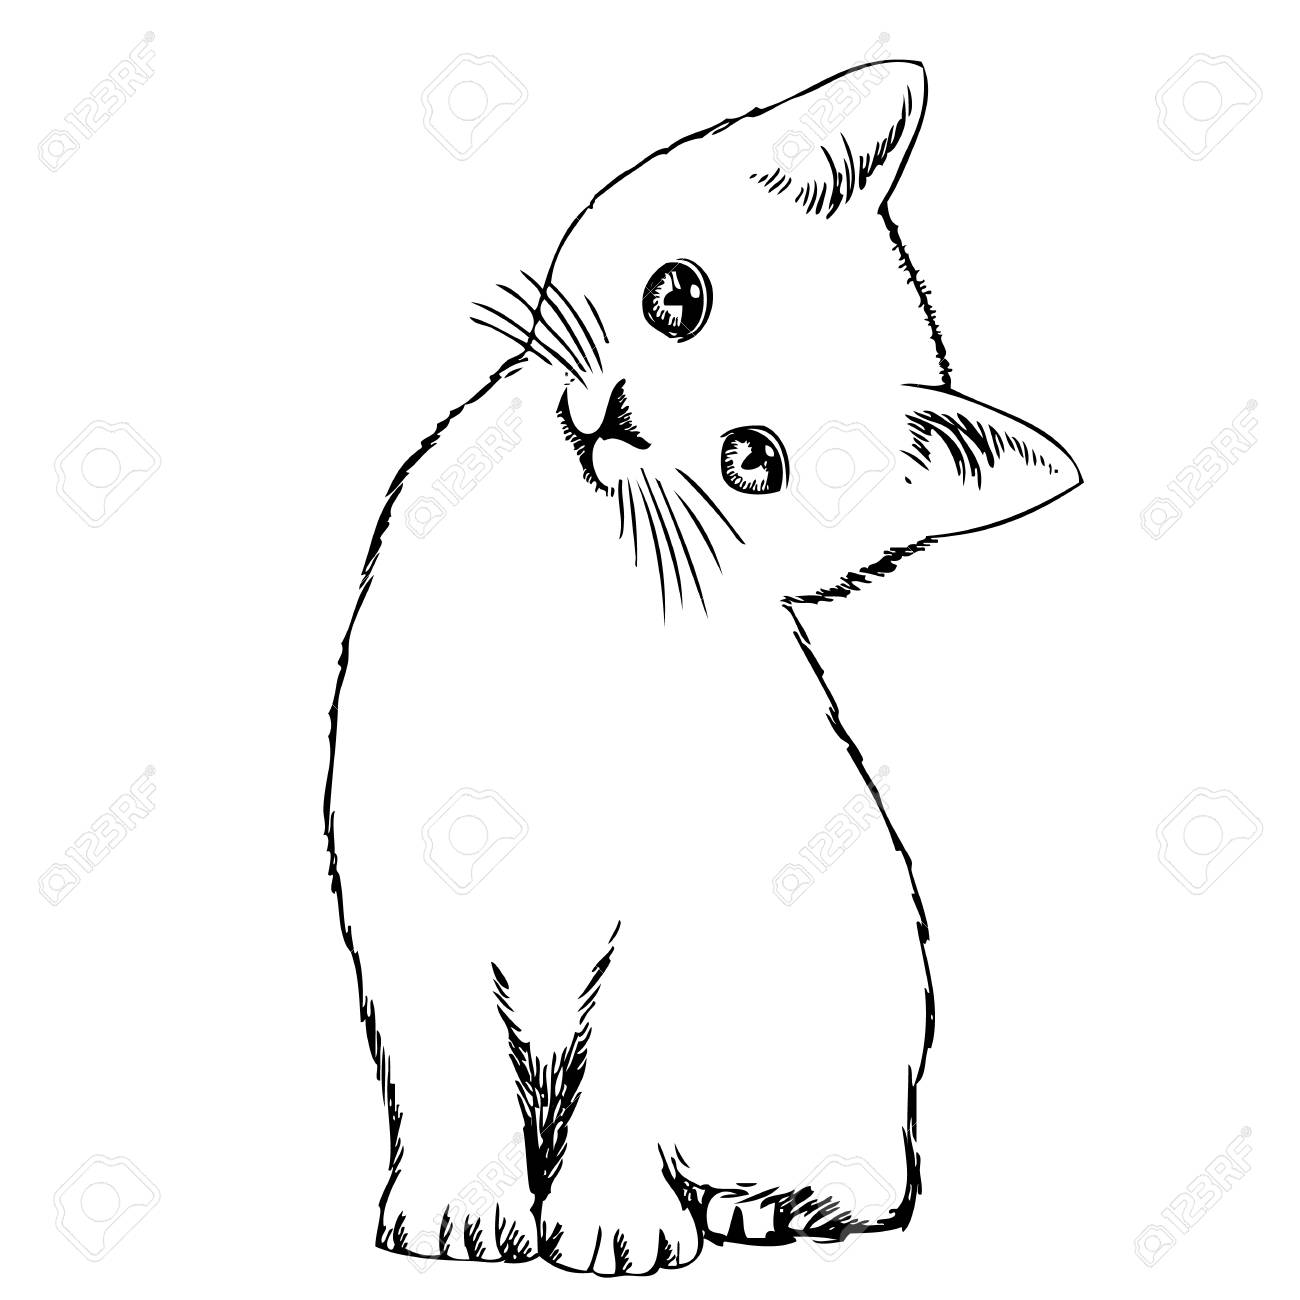 1300x1300 Freehand Sketch Illustration Of Cat, Kitten , Outline, Doodle